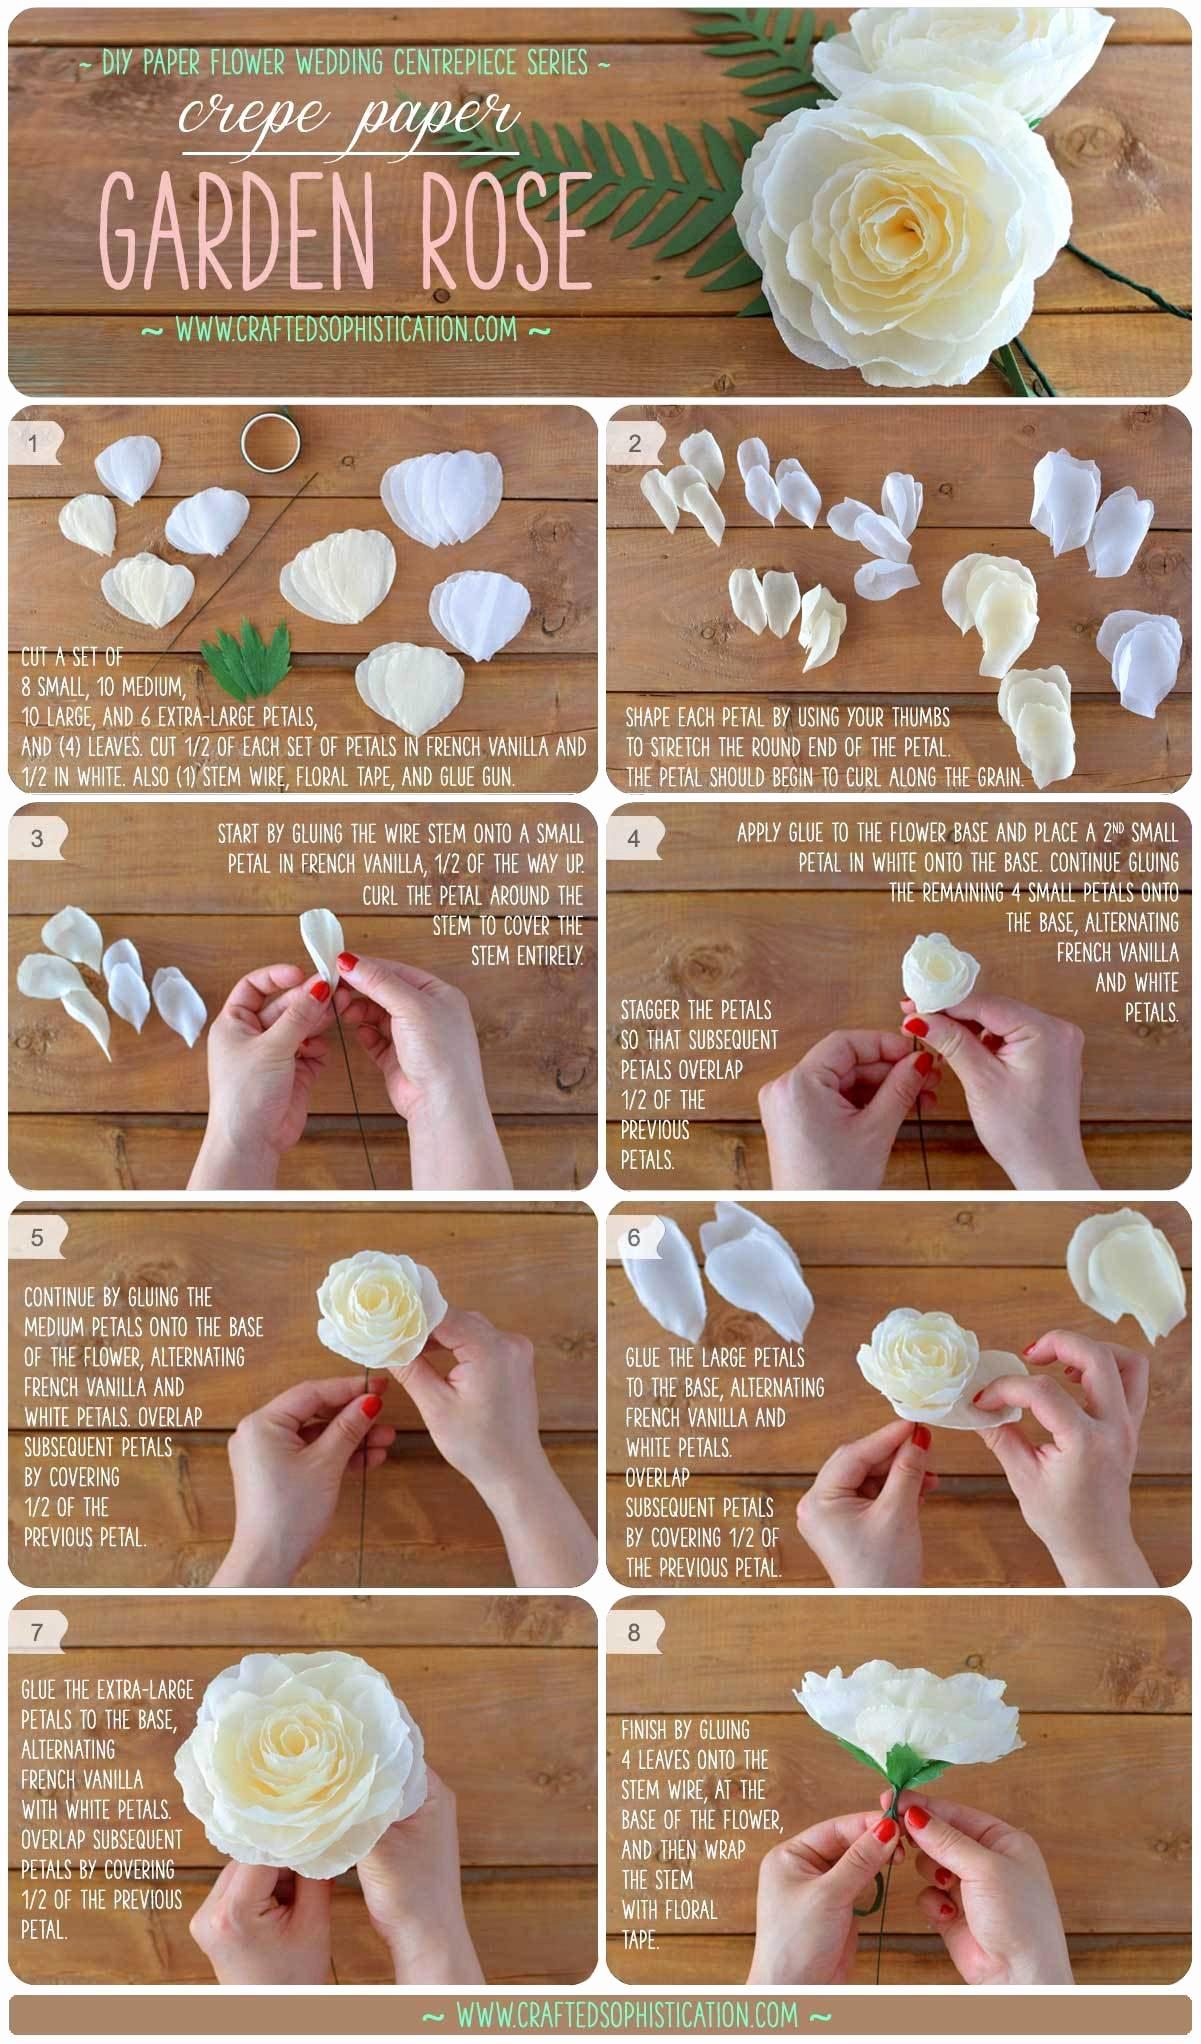 Diy Paper Flower Template Inspirational Diy Crepe Paper Garden Rose